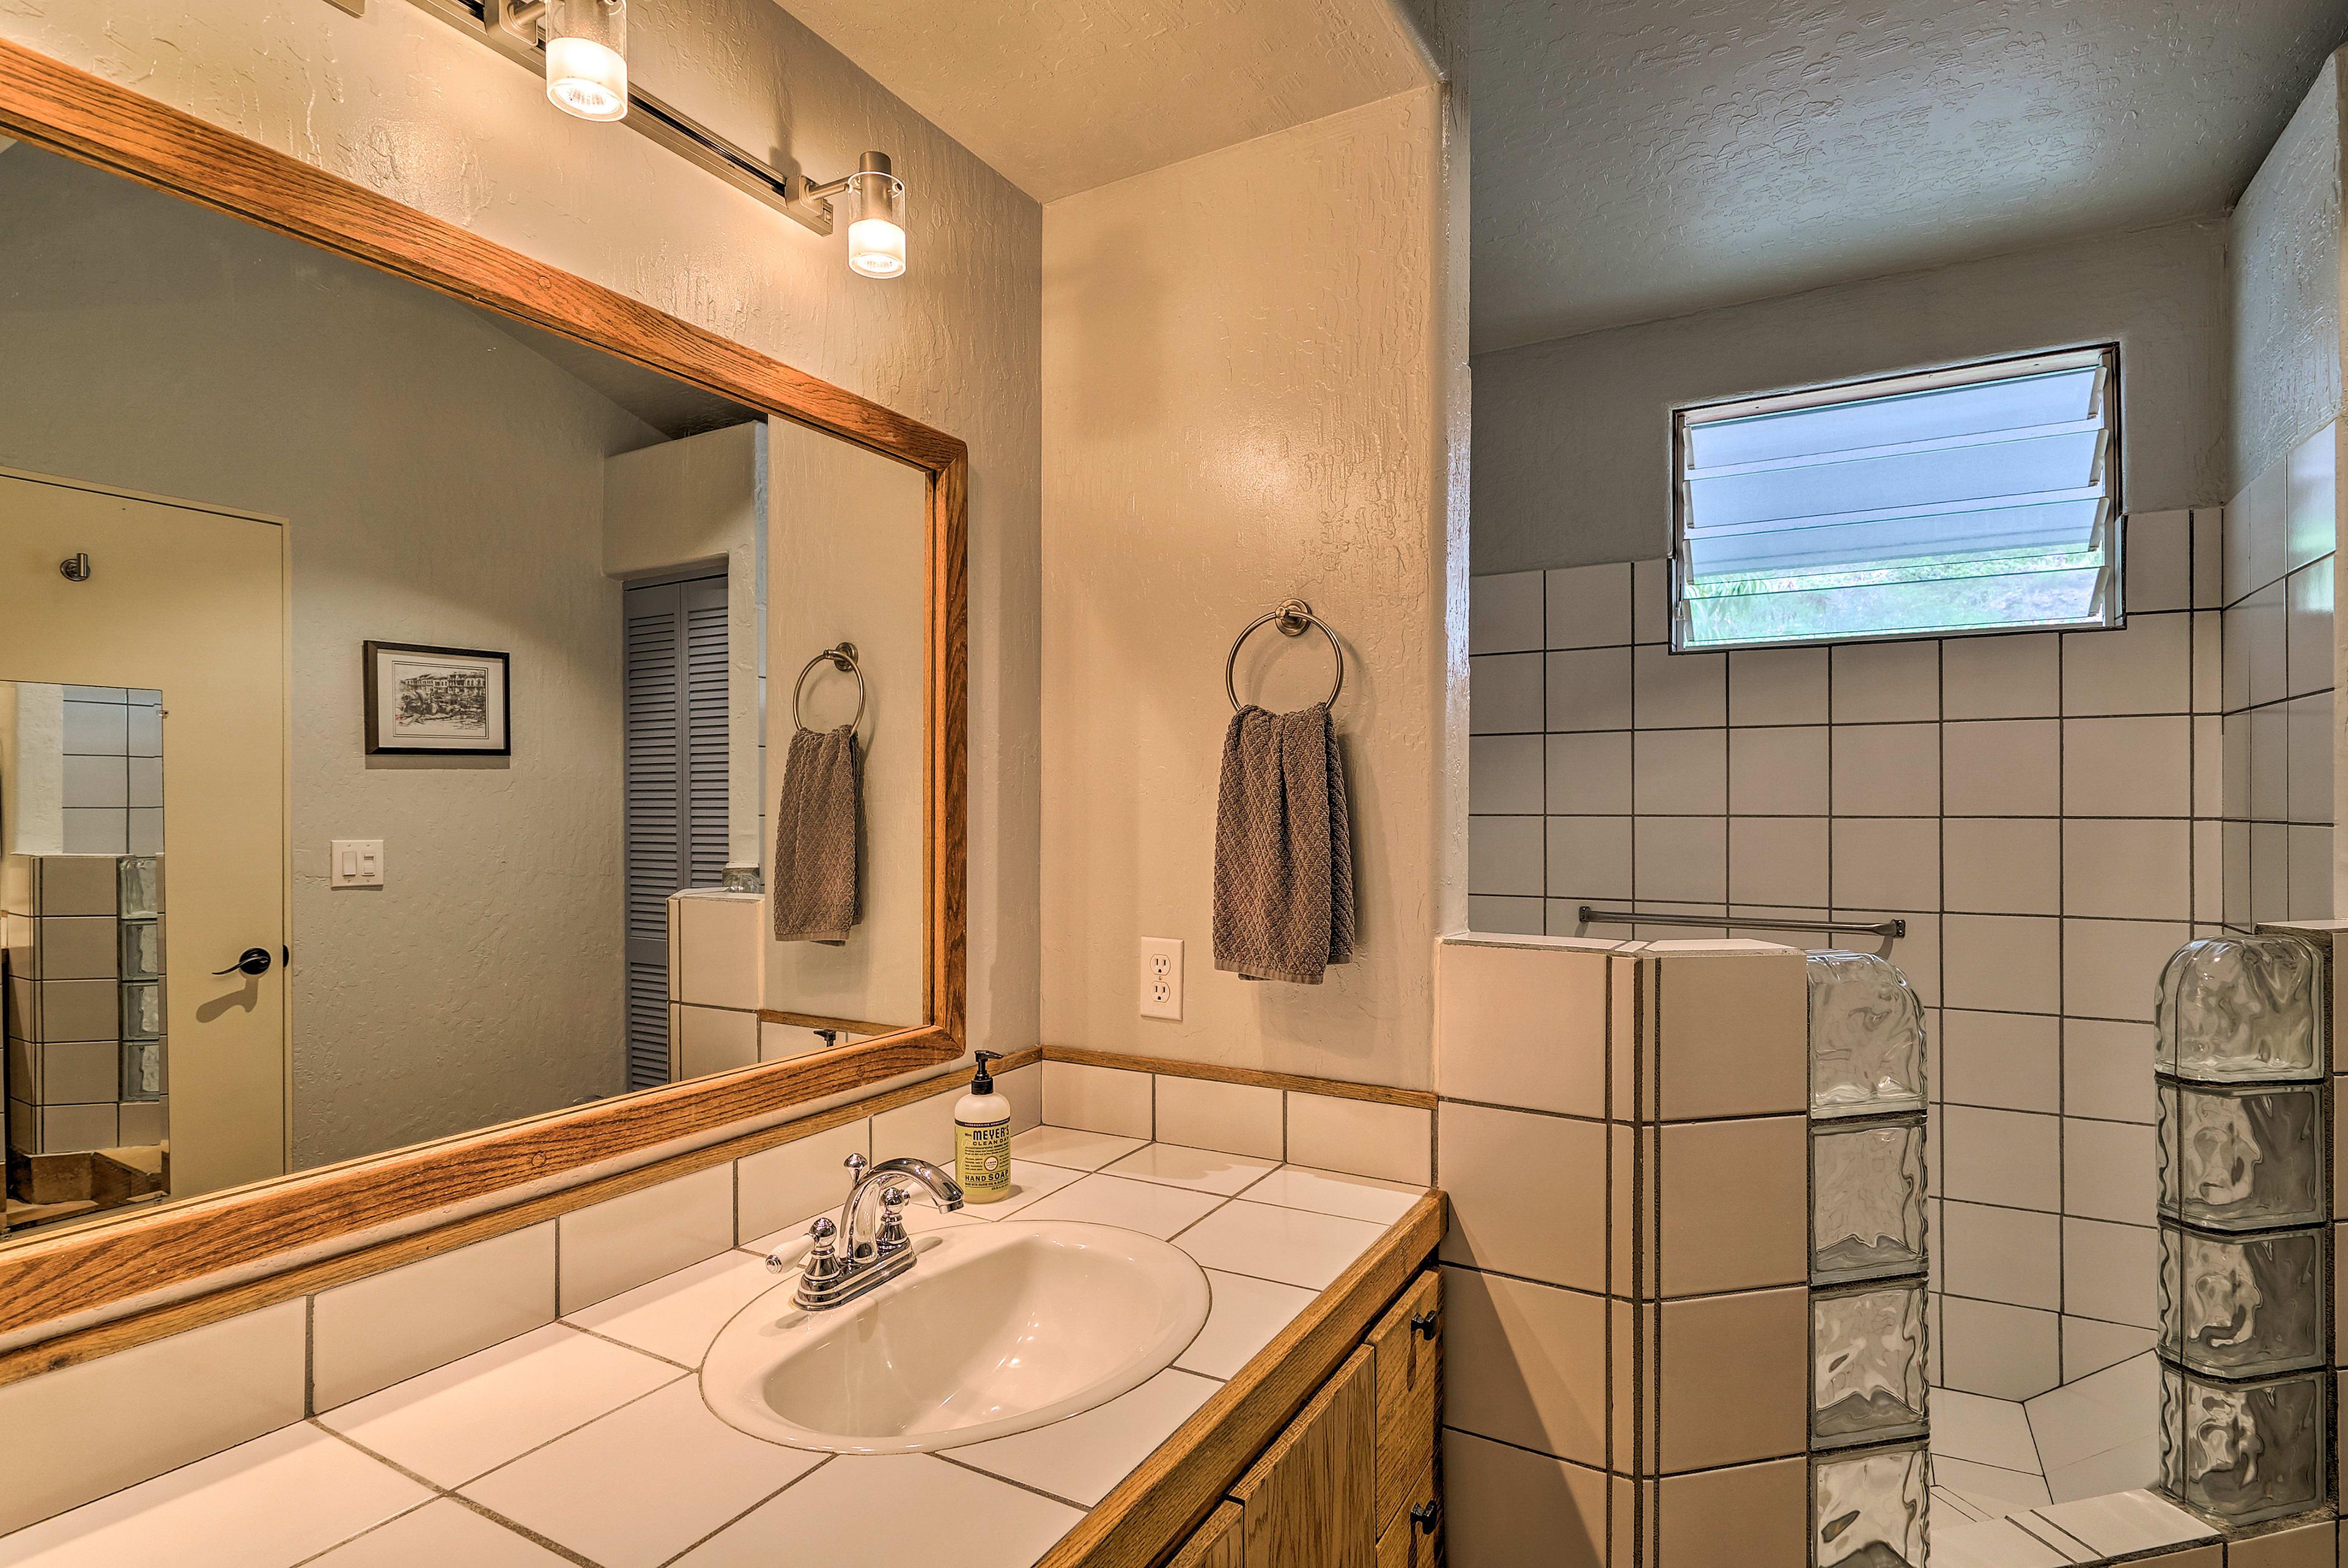 Each bedroom offers an en-suite bath.